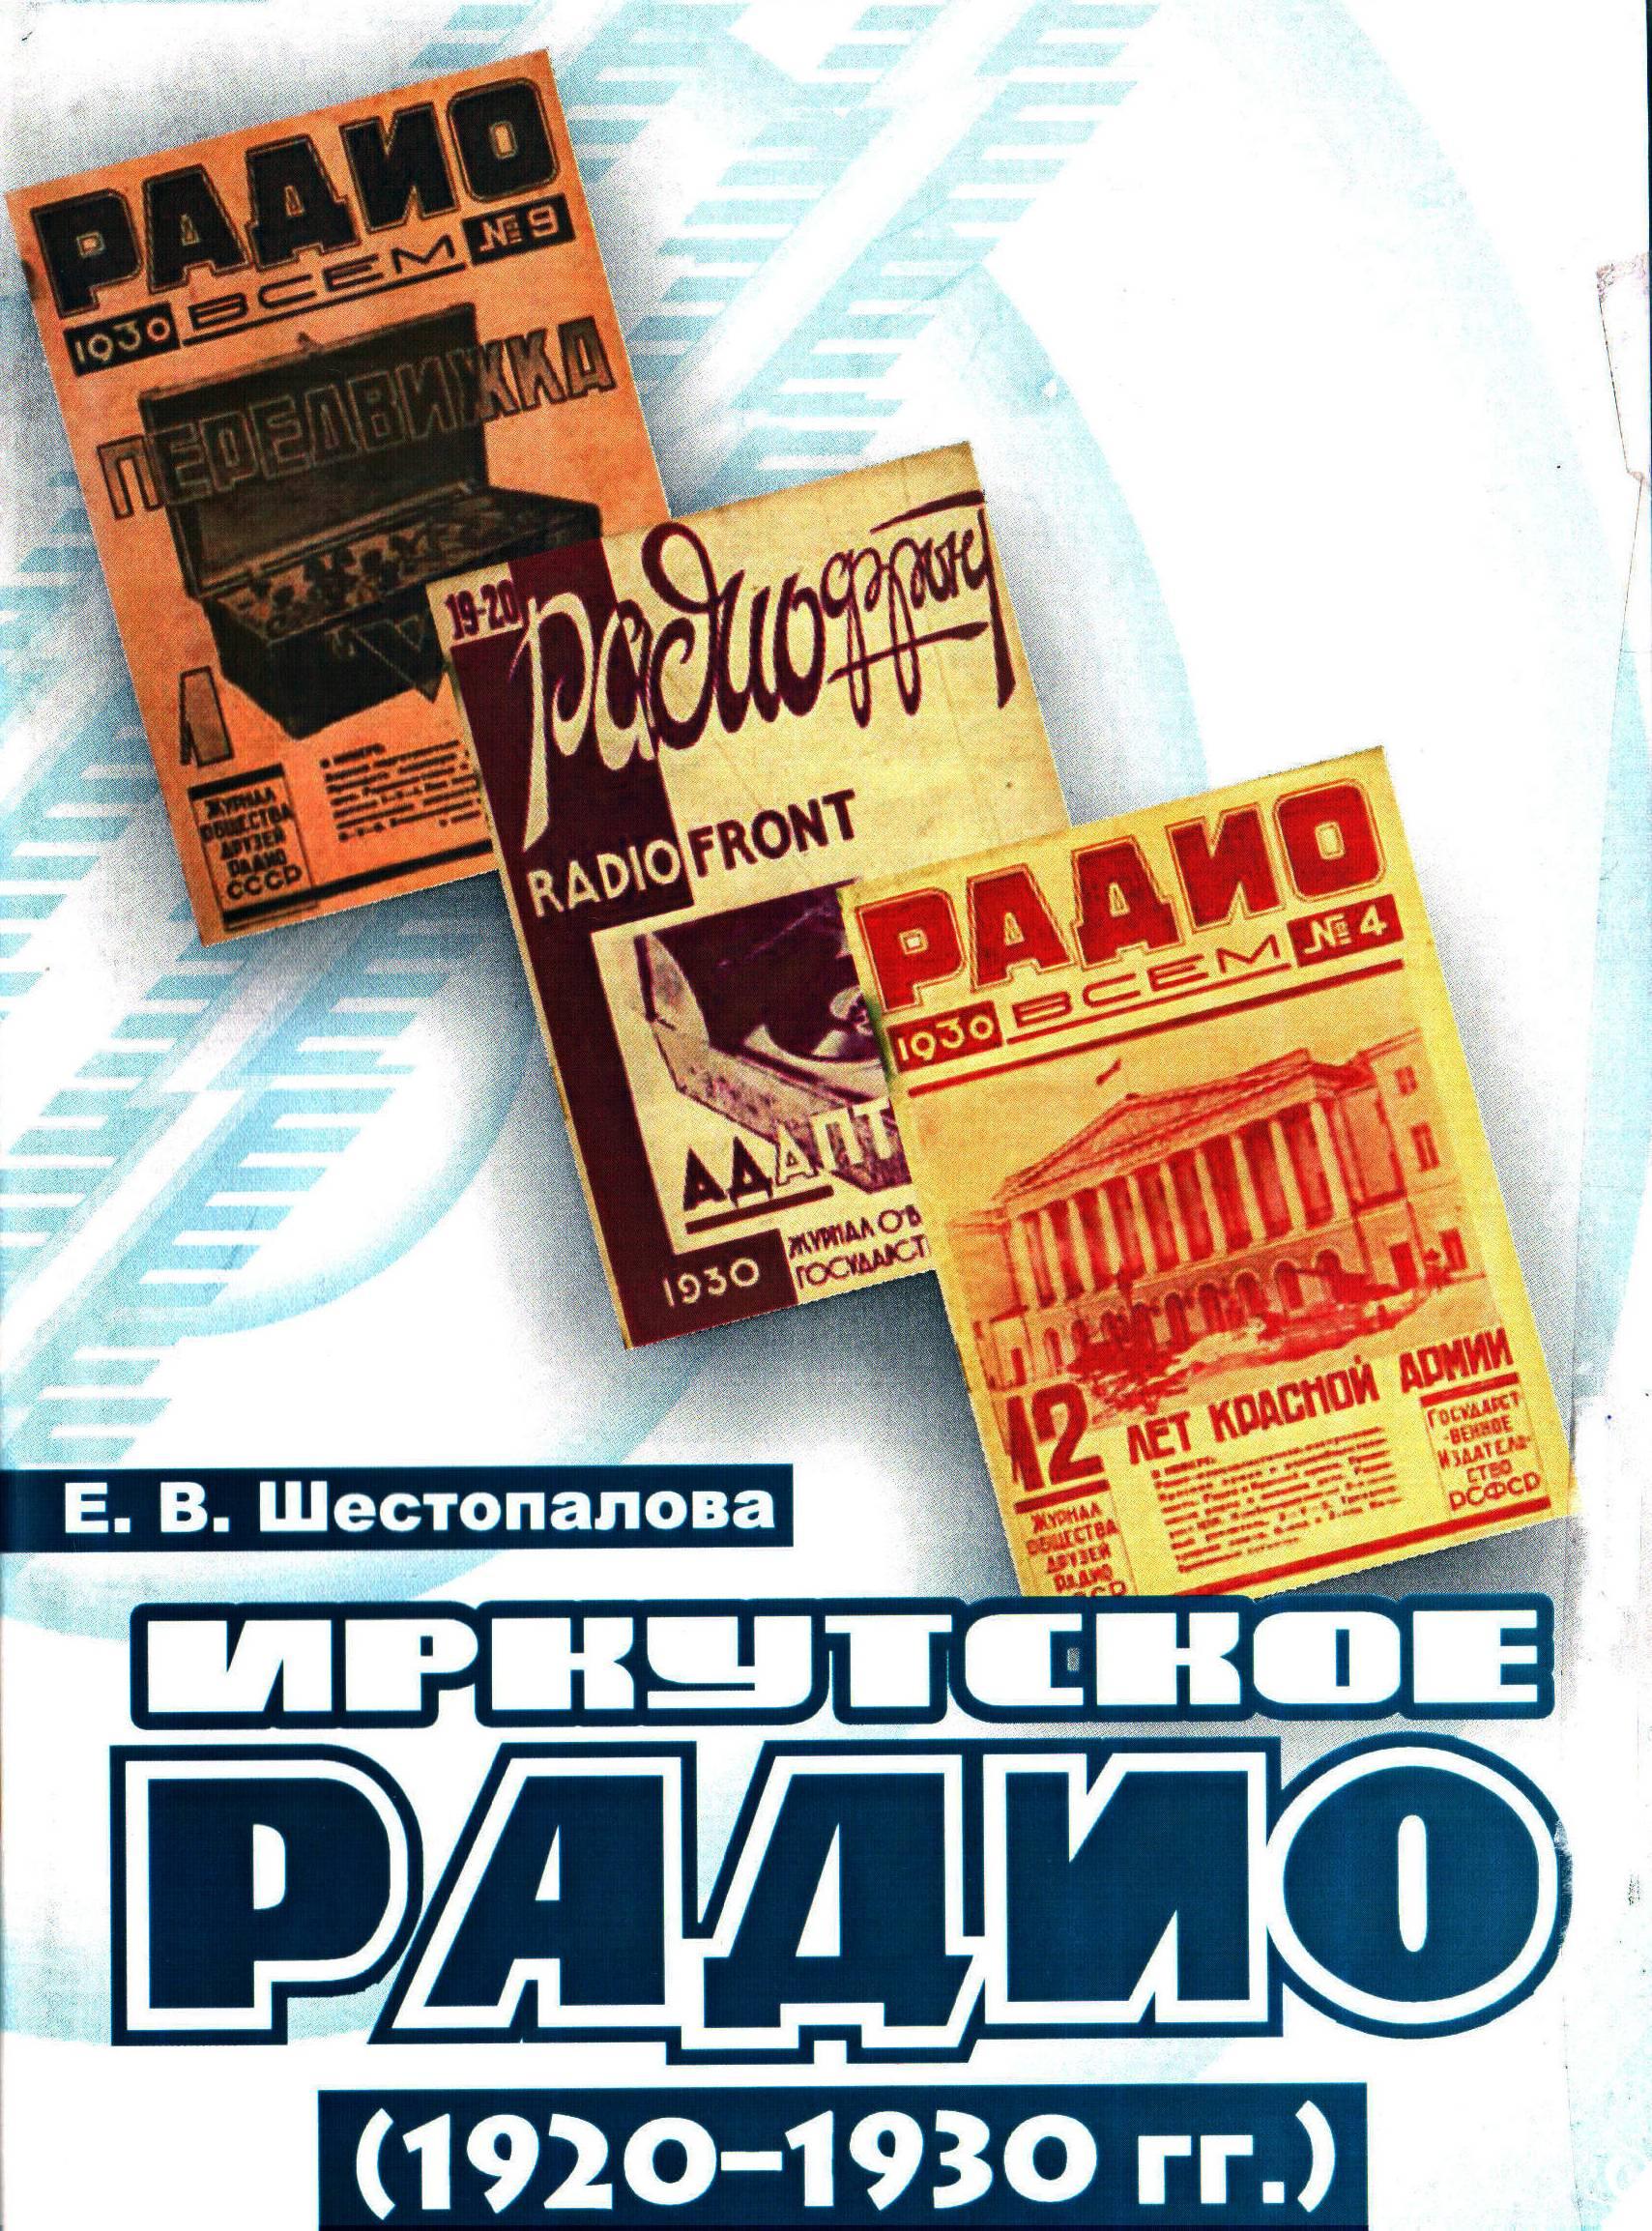 Иркутское радио (1920–1930 гг.)